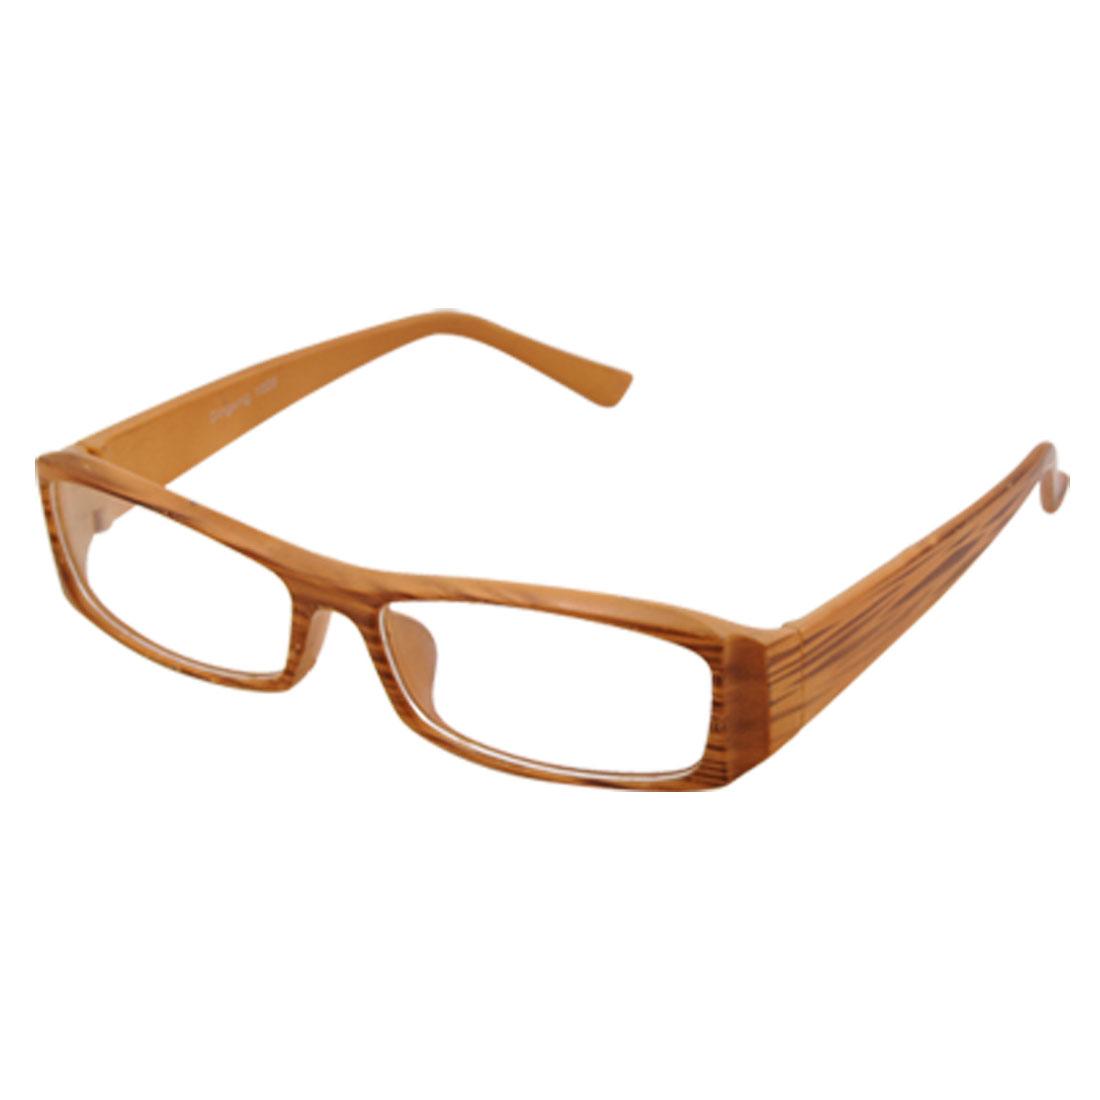 Wood Grain Design Plastic Full Rim Clear Lens Plano Glasses Spectacles